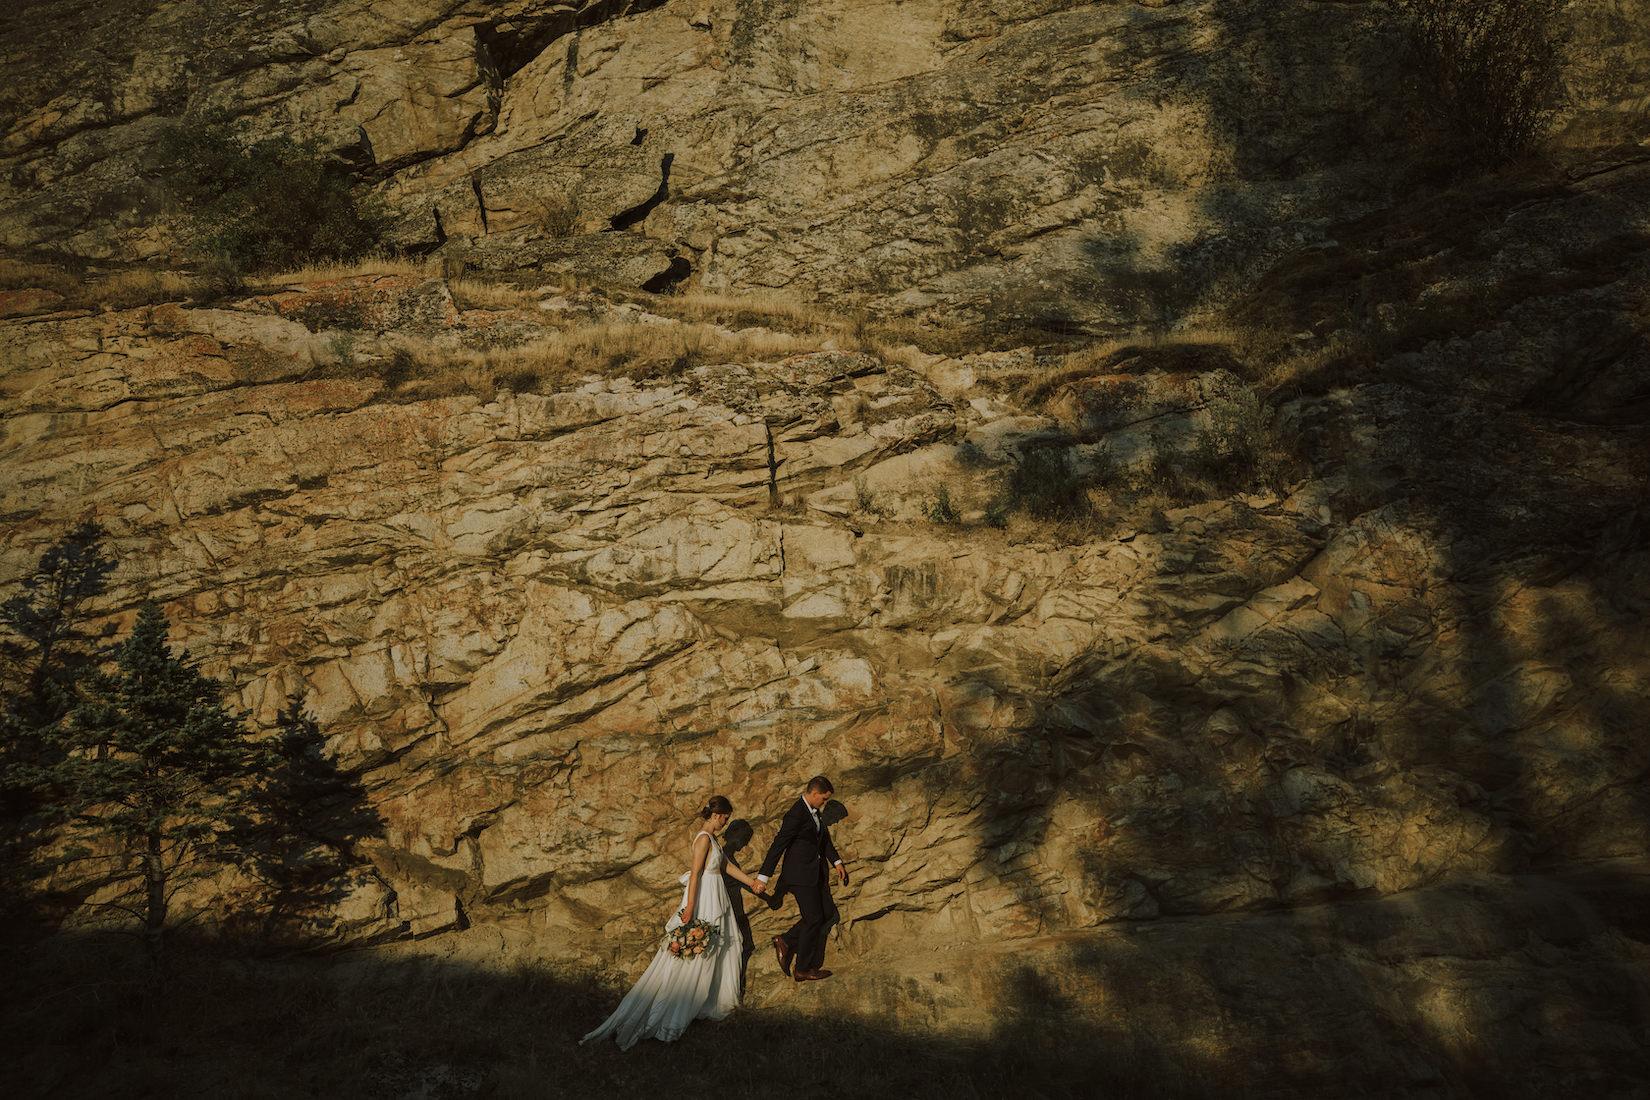 Gods-mountain-estate-weddings-30.jpg